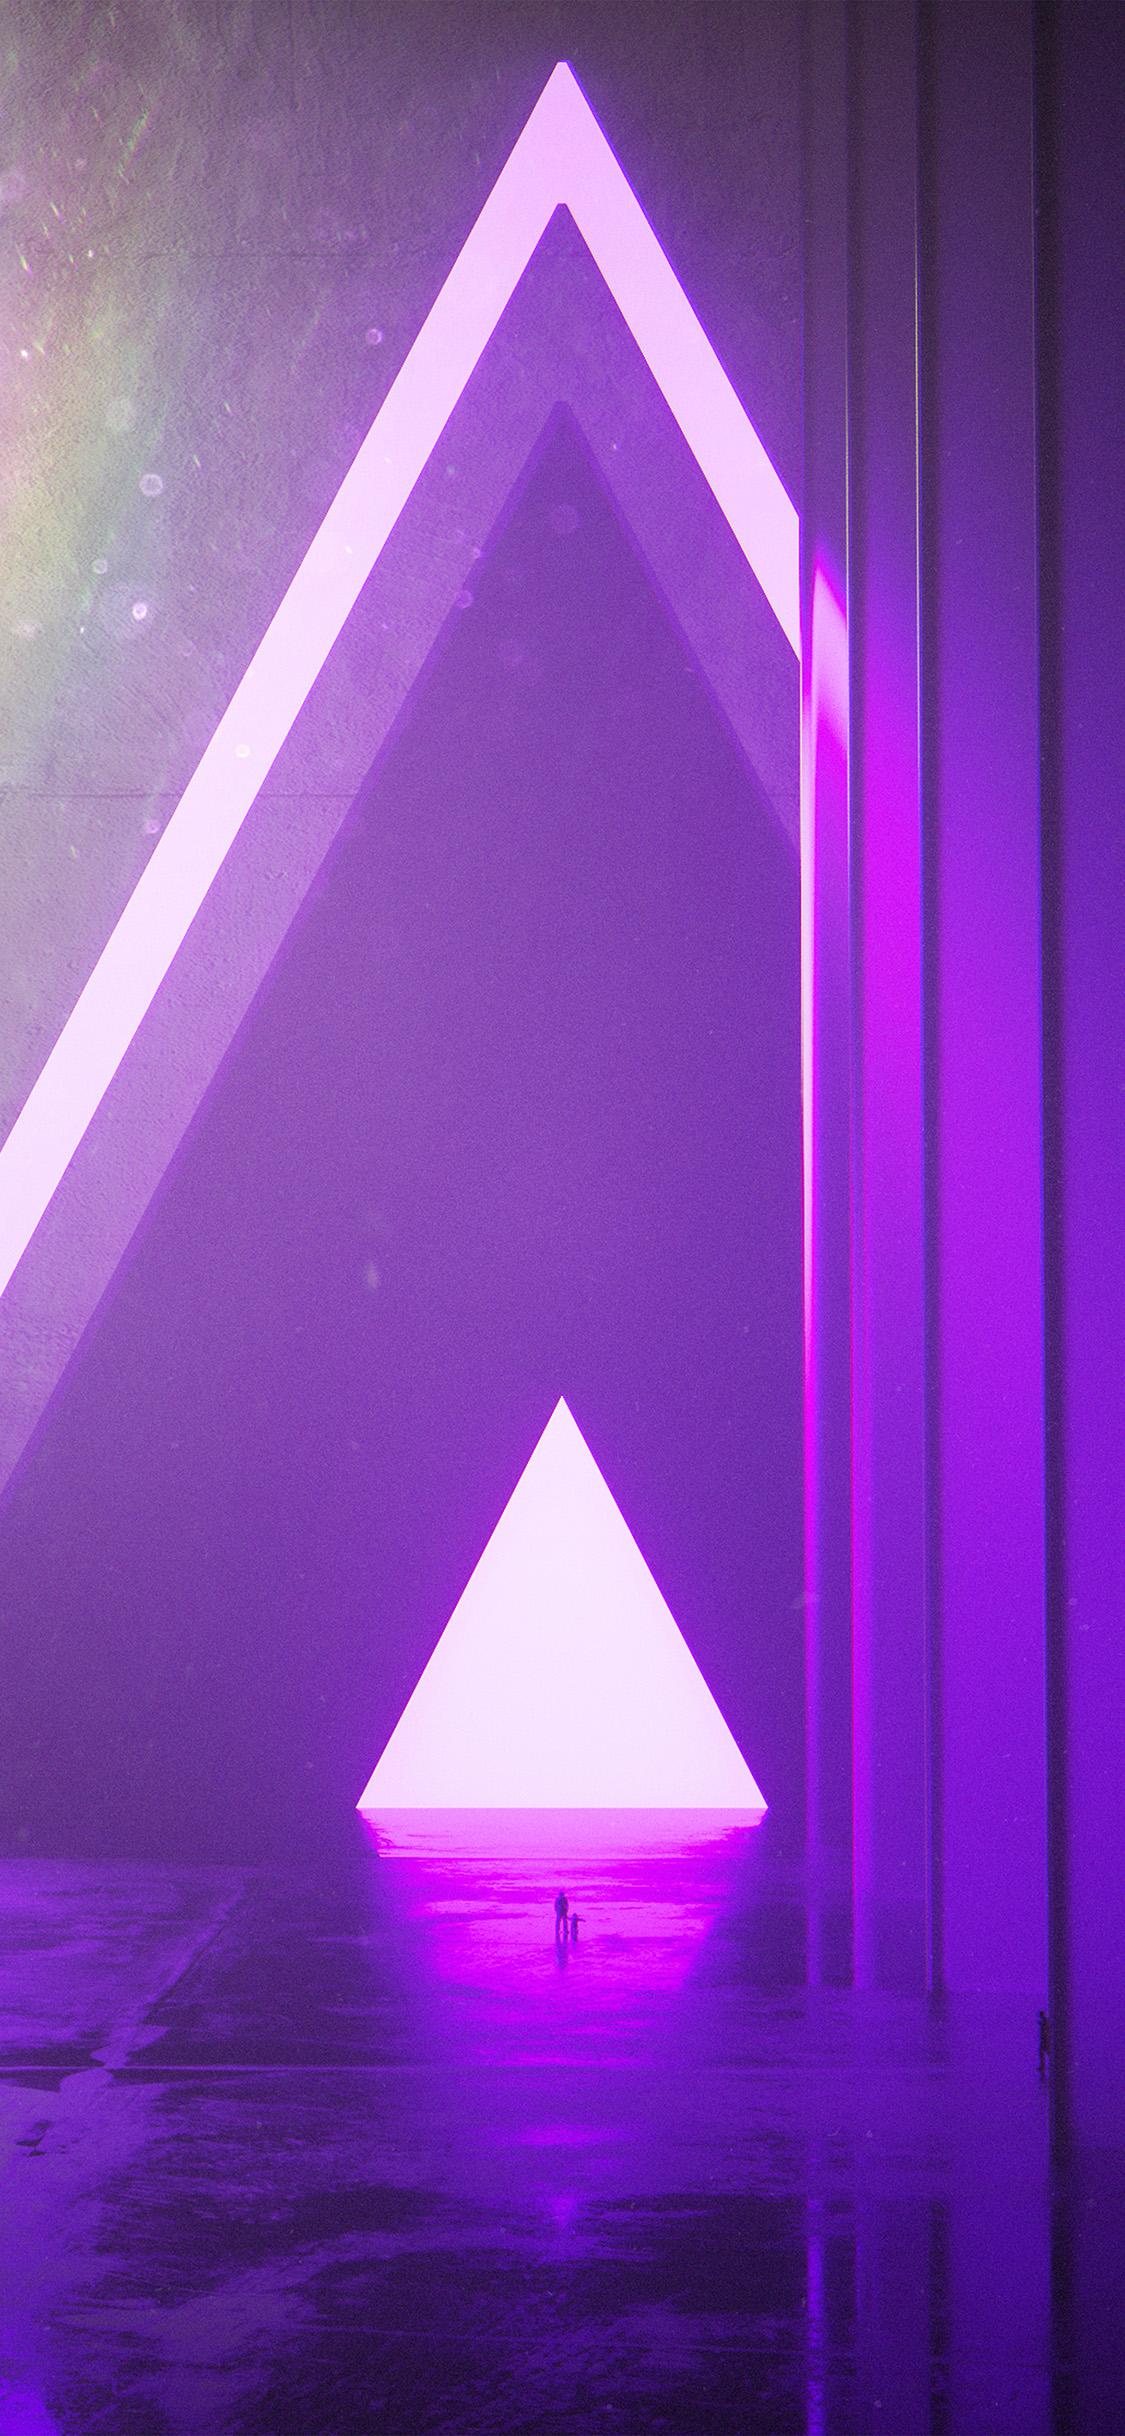 Iphone11papers Com Iphone11 Wallpaper Bh22 Triangle Digital Light Purple Art